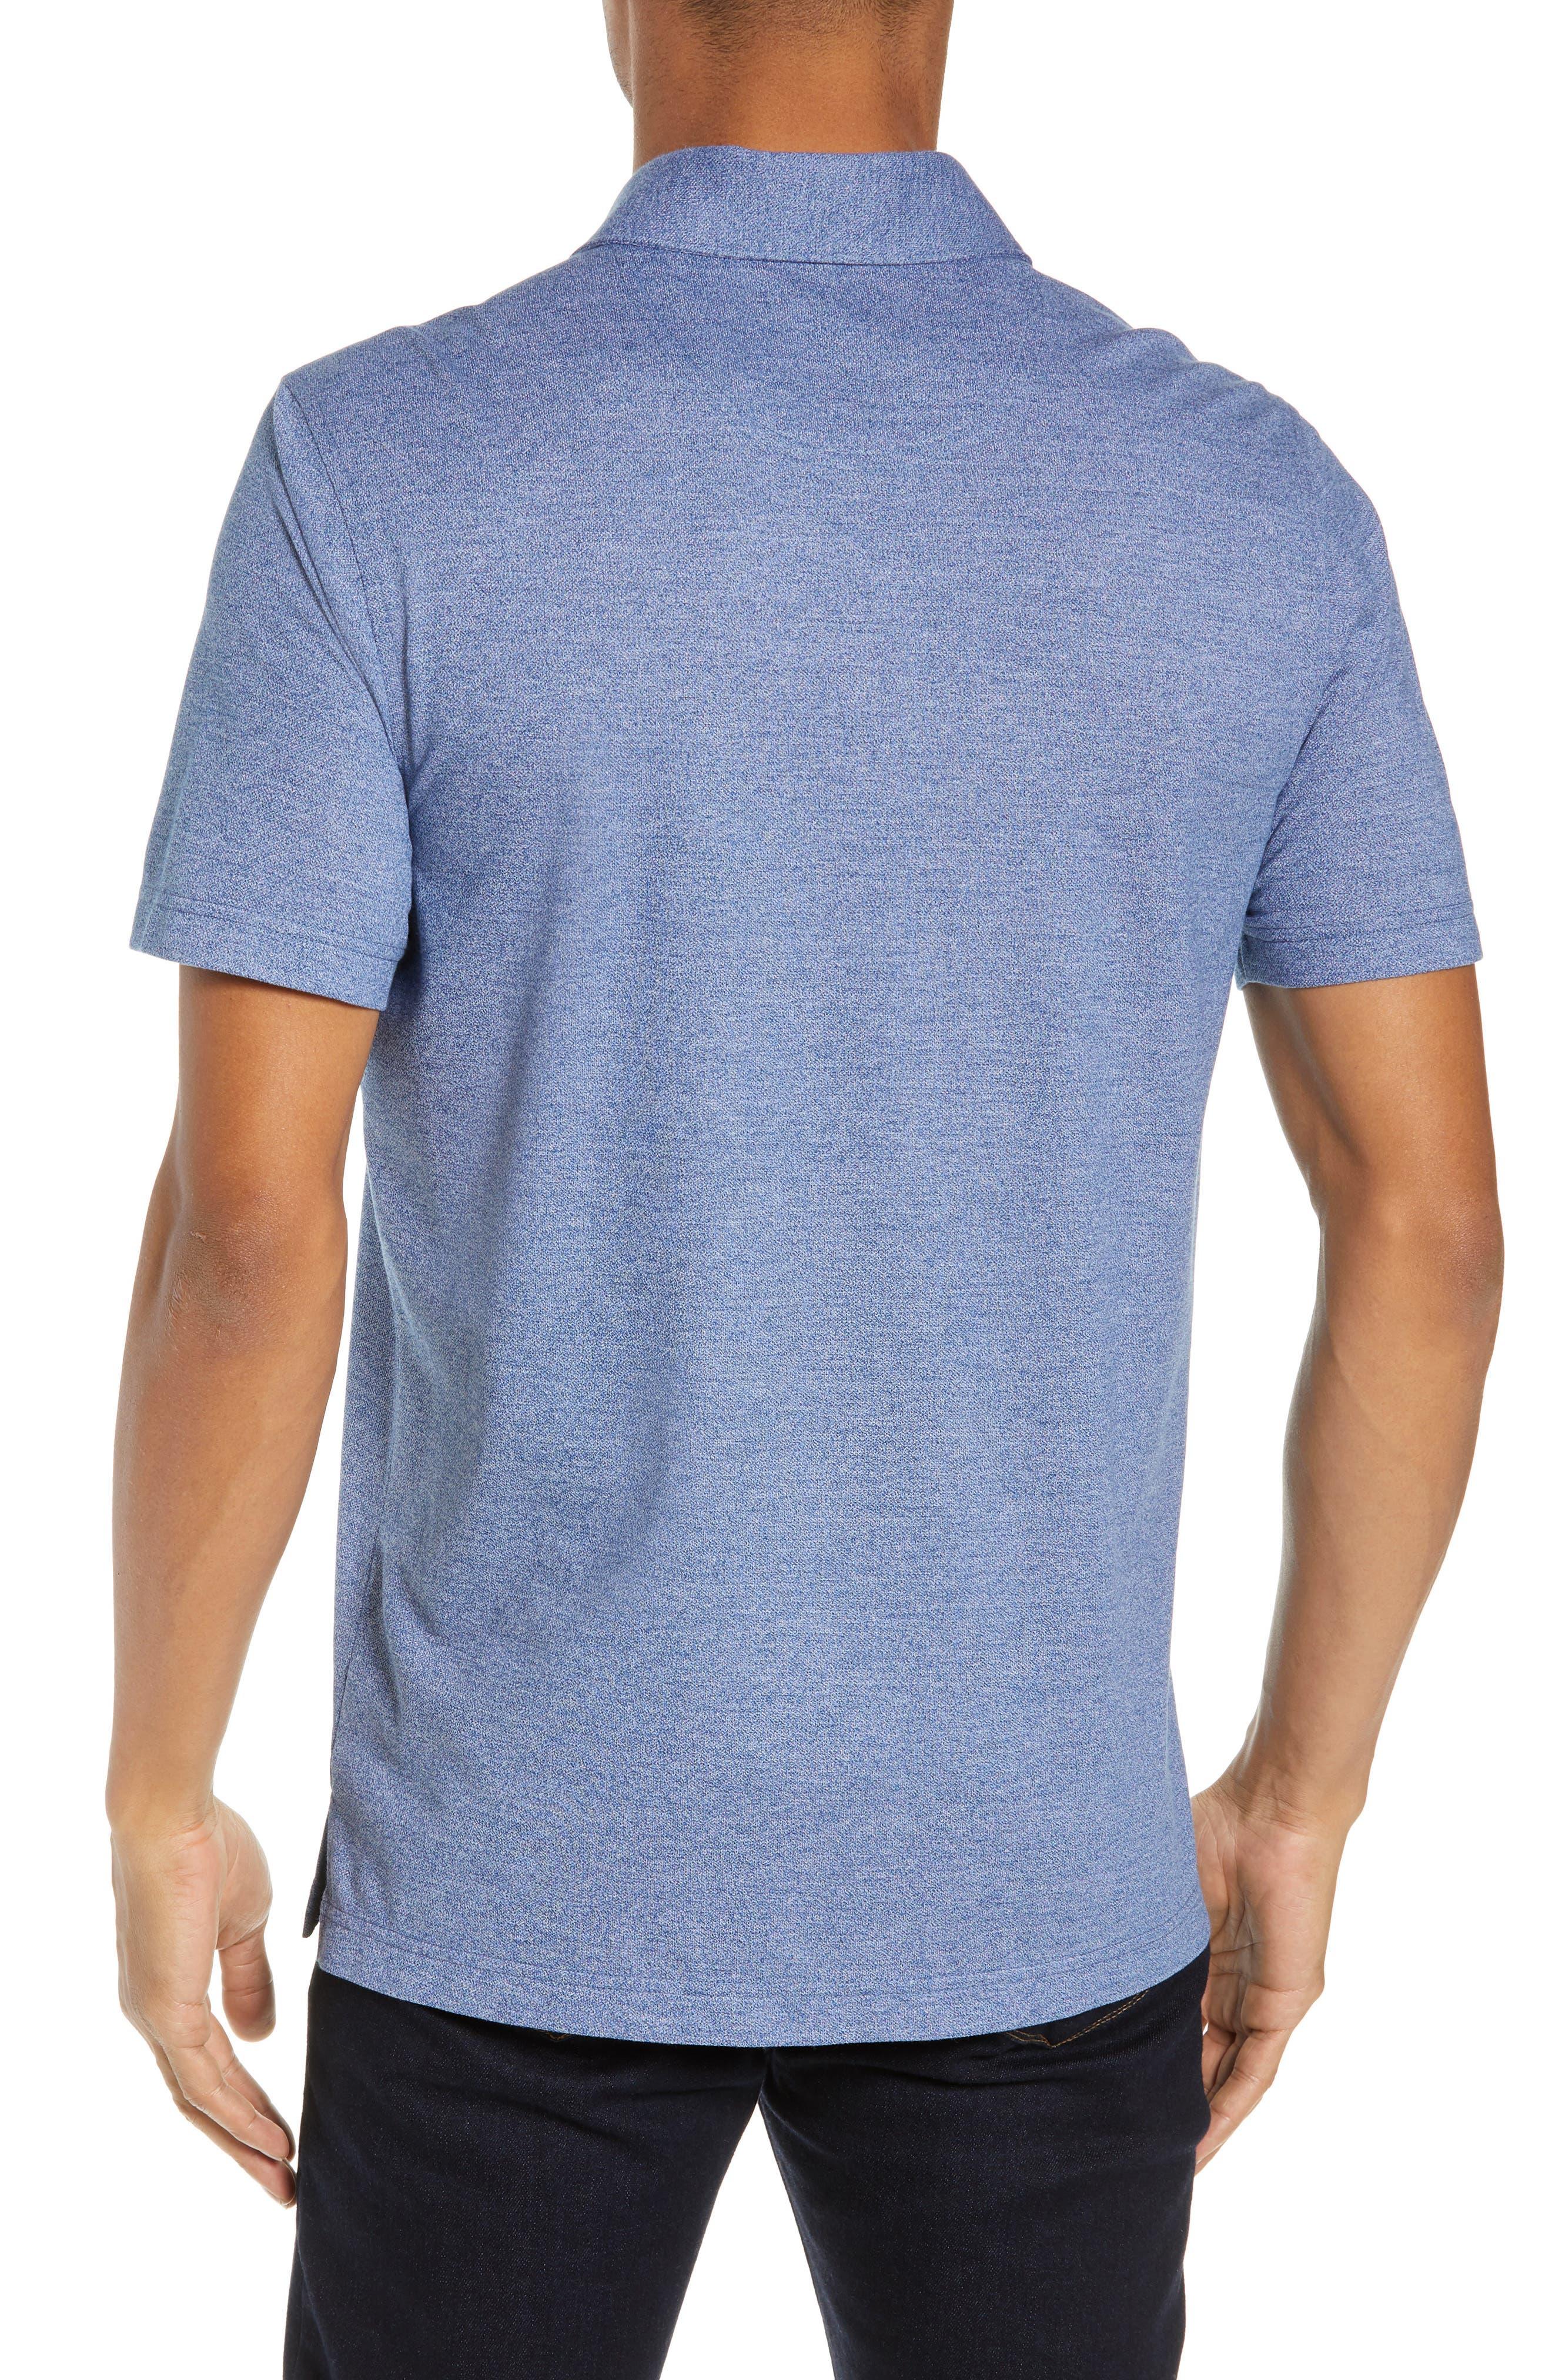 NORDSTROM MEN'S SHOP,                             Regular Fit Polo,                             Alternate thumbnail 2, color,                             BLUE CASPIA MELANGE